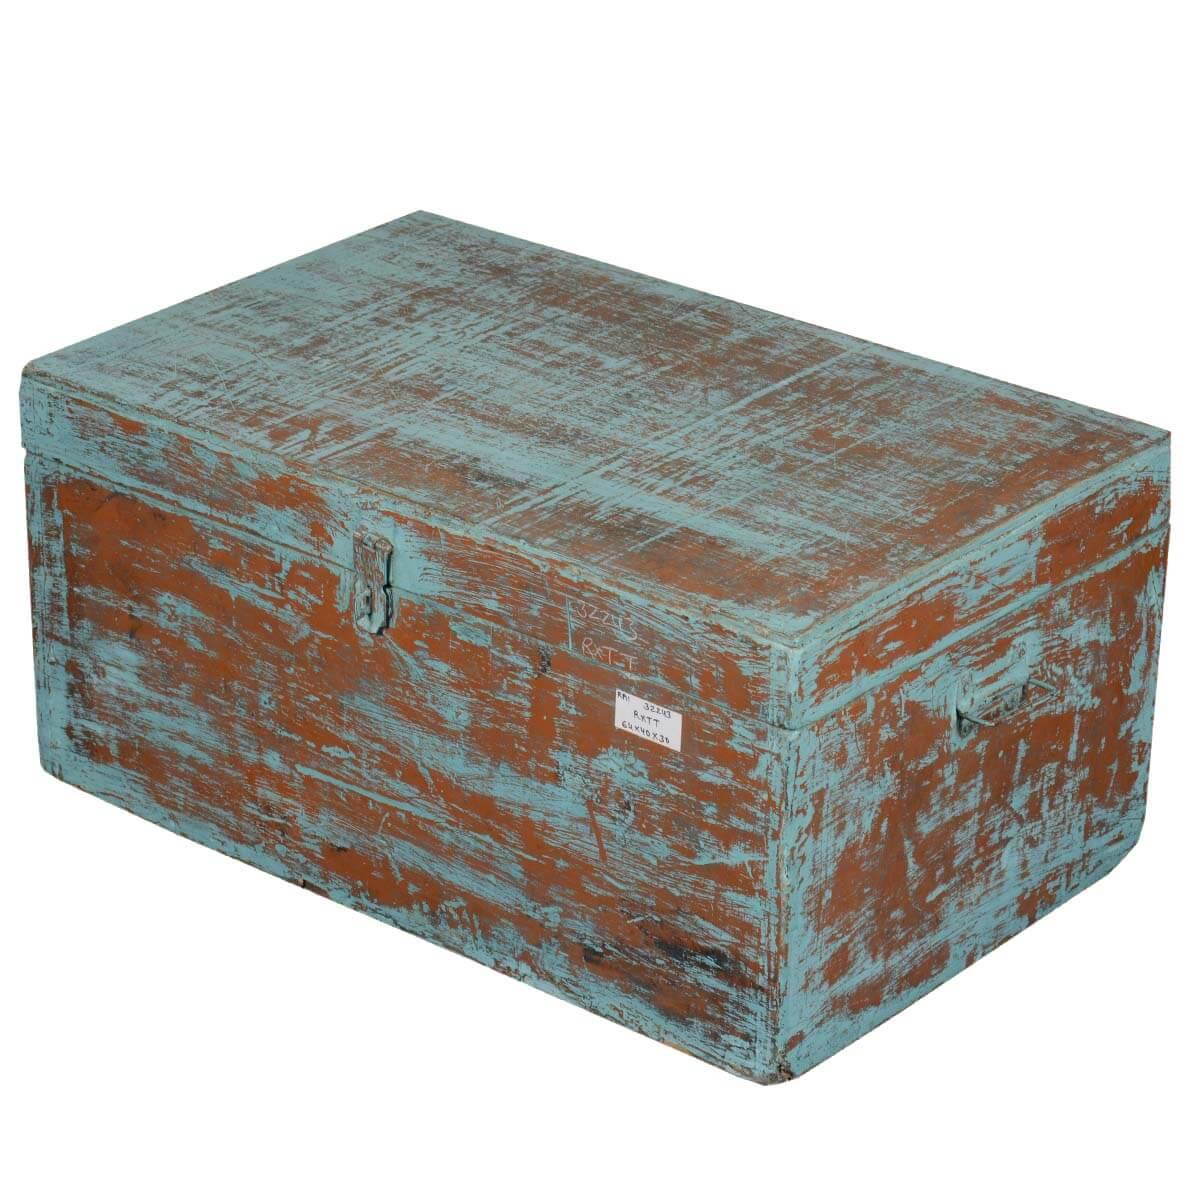 Obetz Distressed Blue Reclaimed Wood Storage Trunk